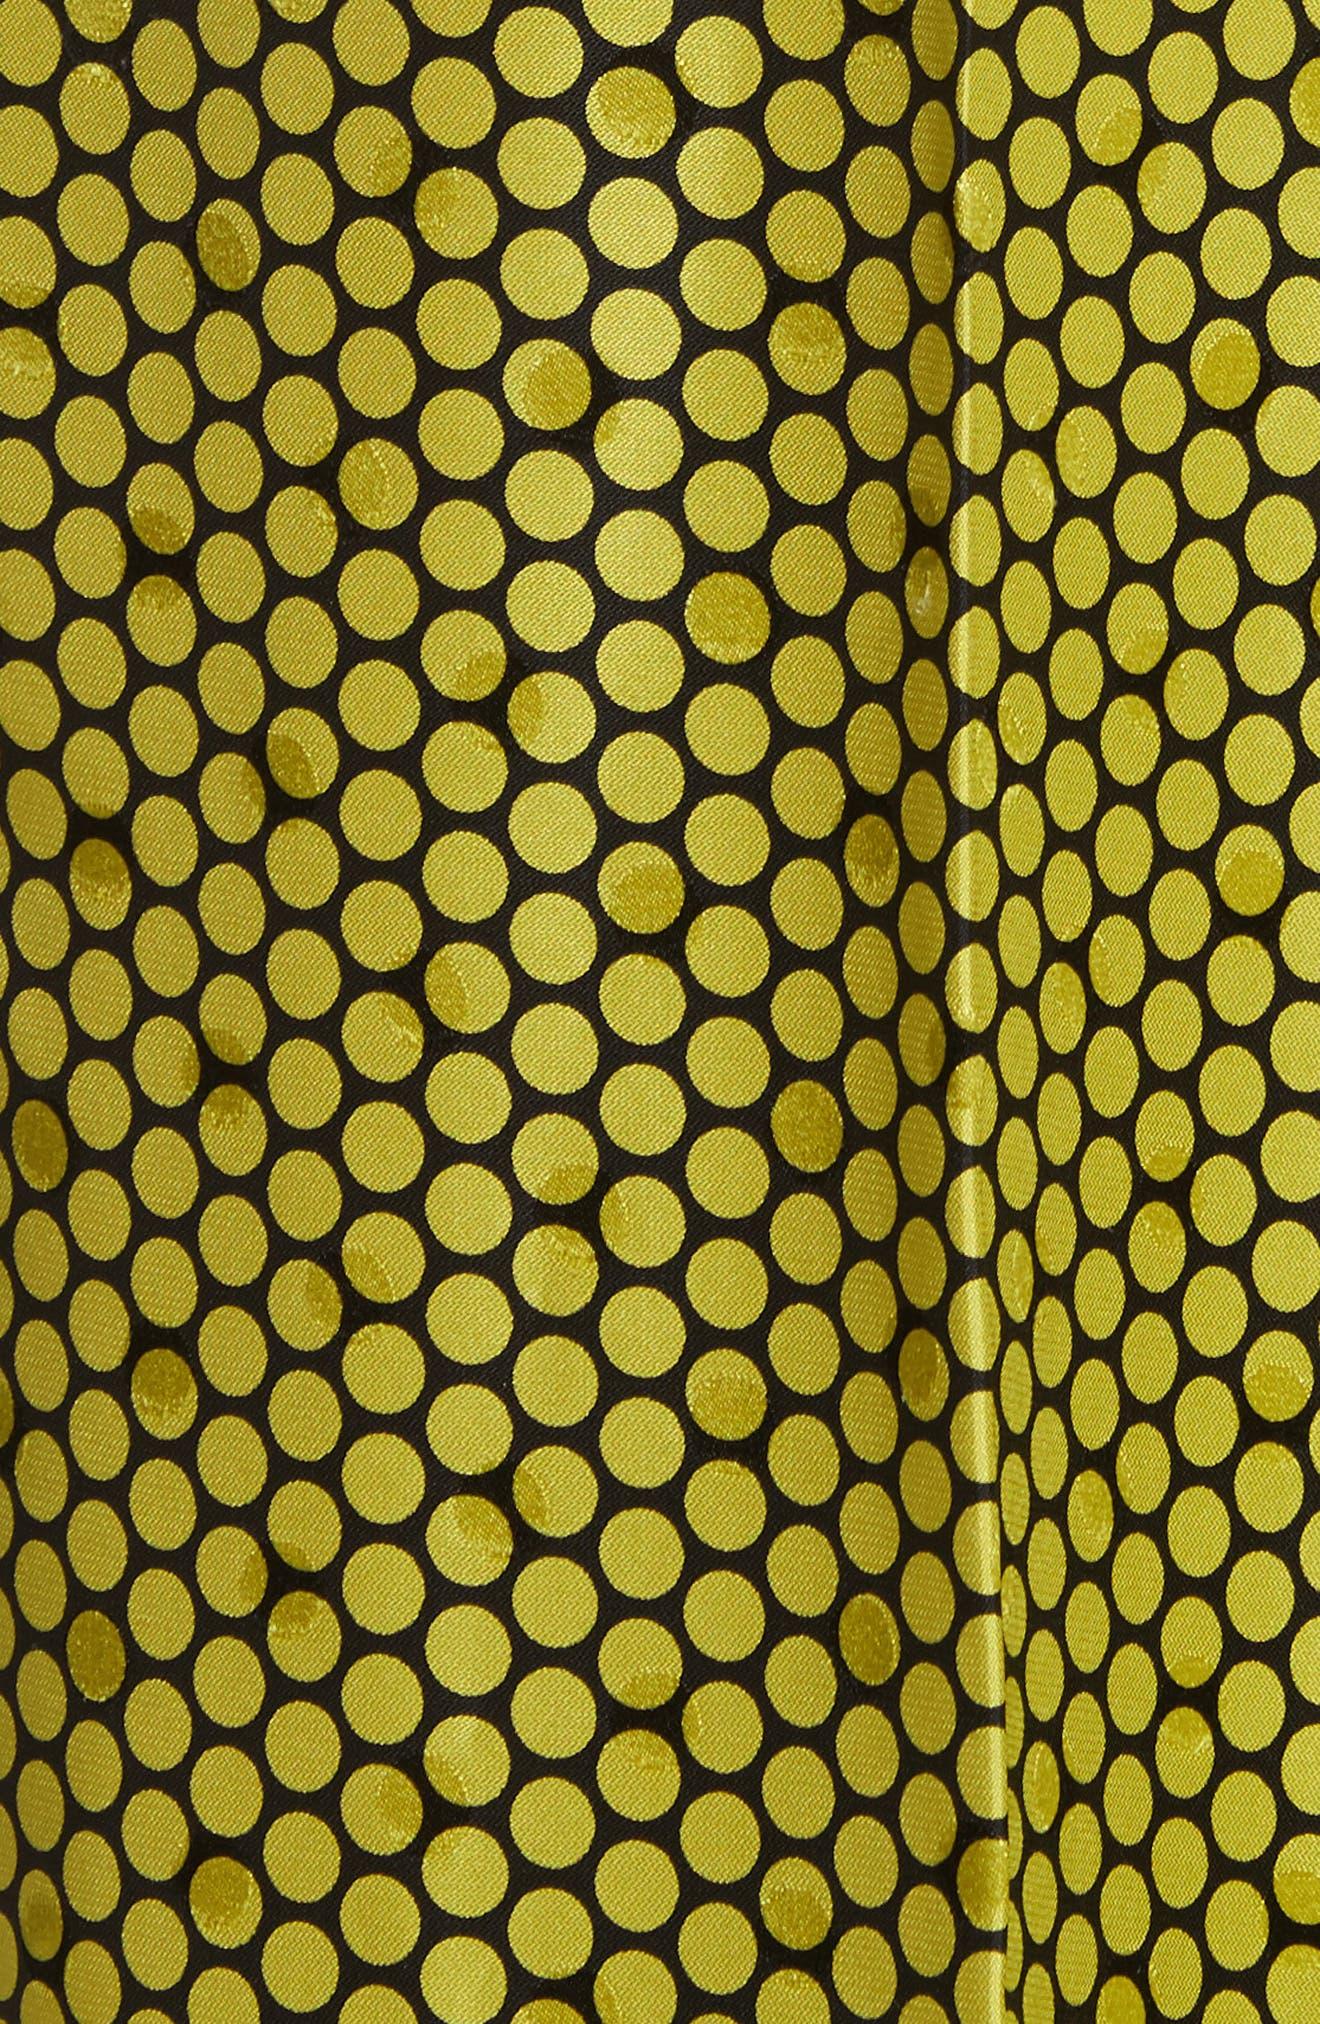 Diane von Furstenberg Dot Silk Palazzo Pants,                             Alternate thumbnail 5, color,                             390